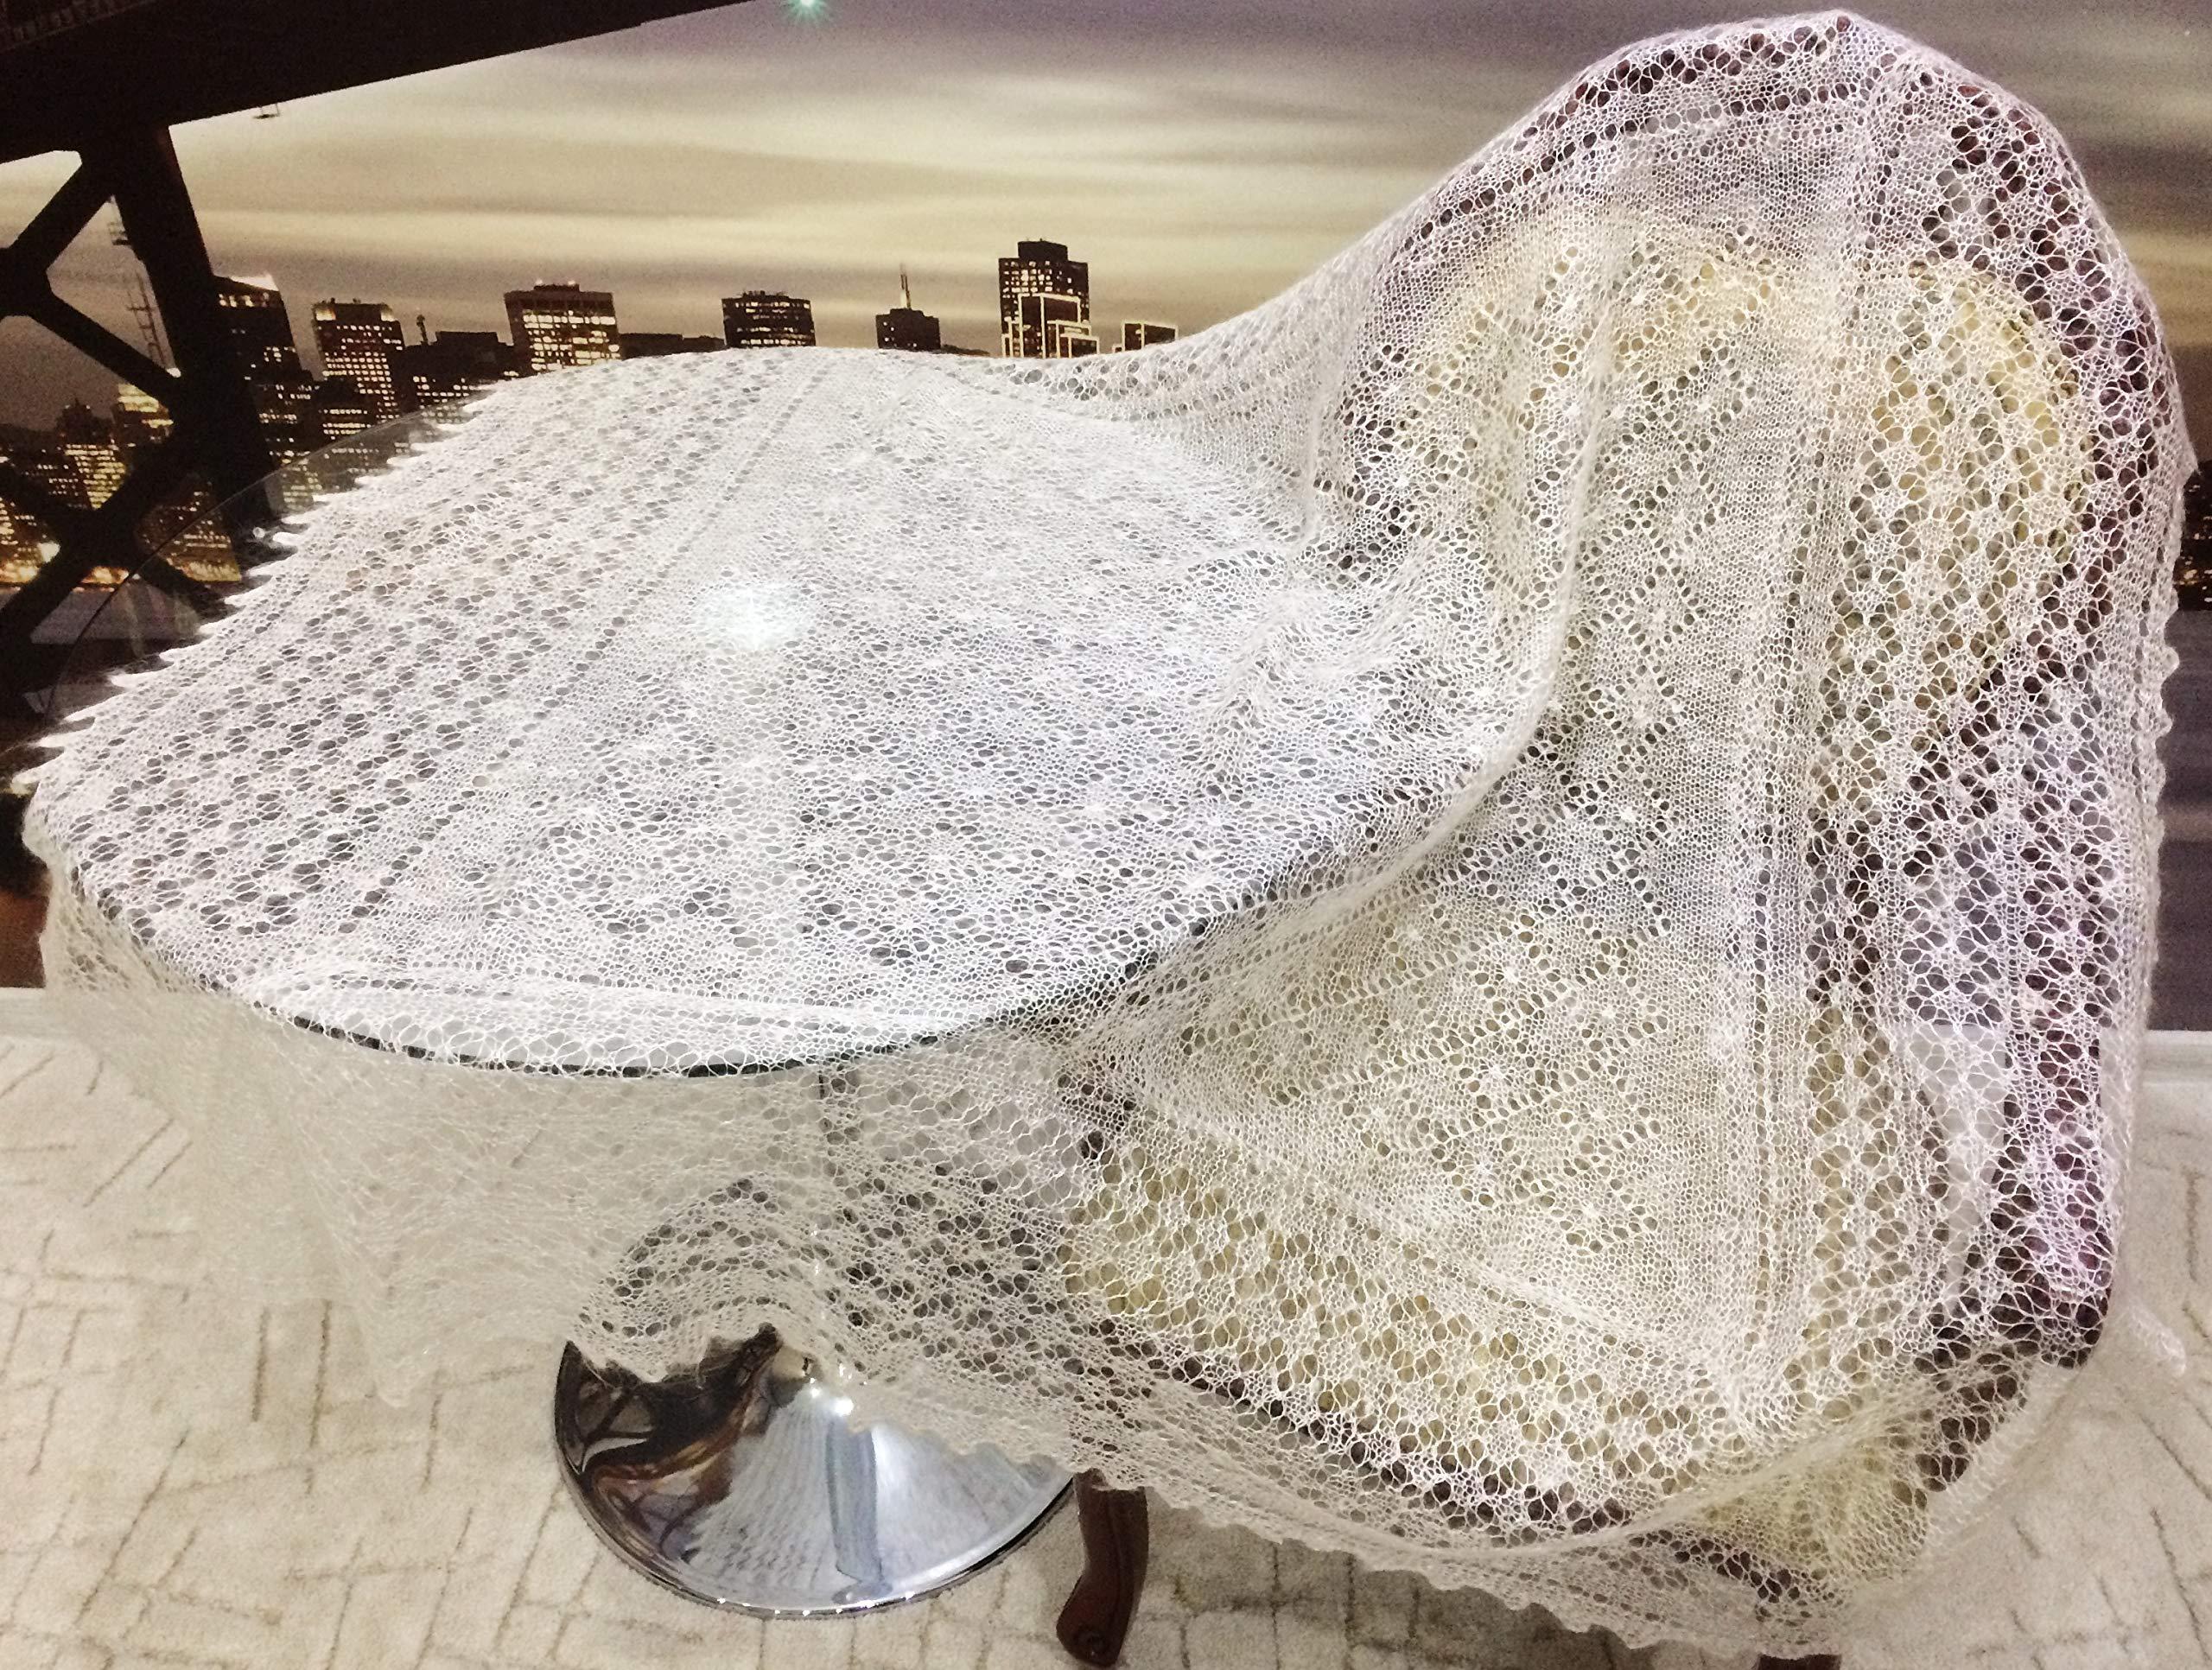 Orenburg shawl, down-hair knitting, Orenburg Shawl, warm gossamer shawls